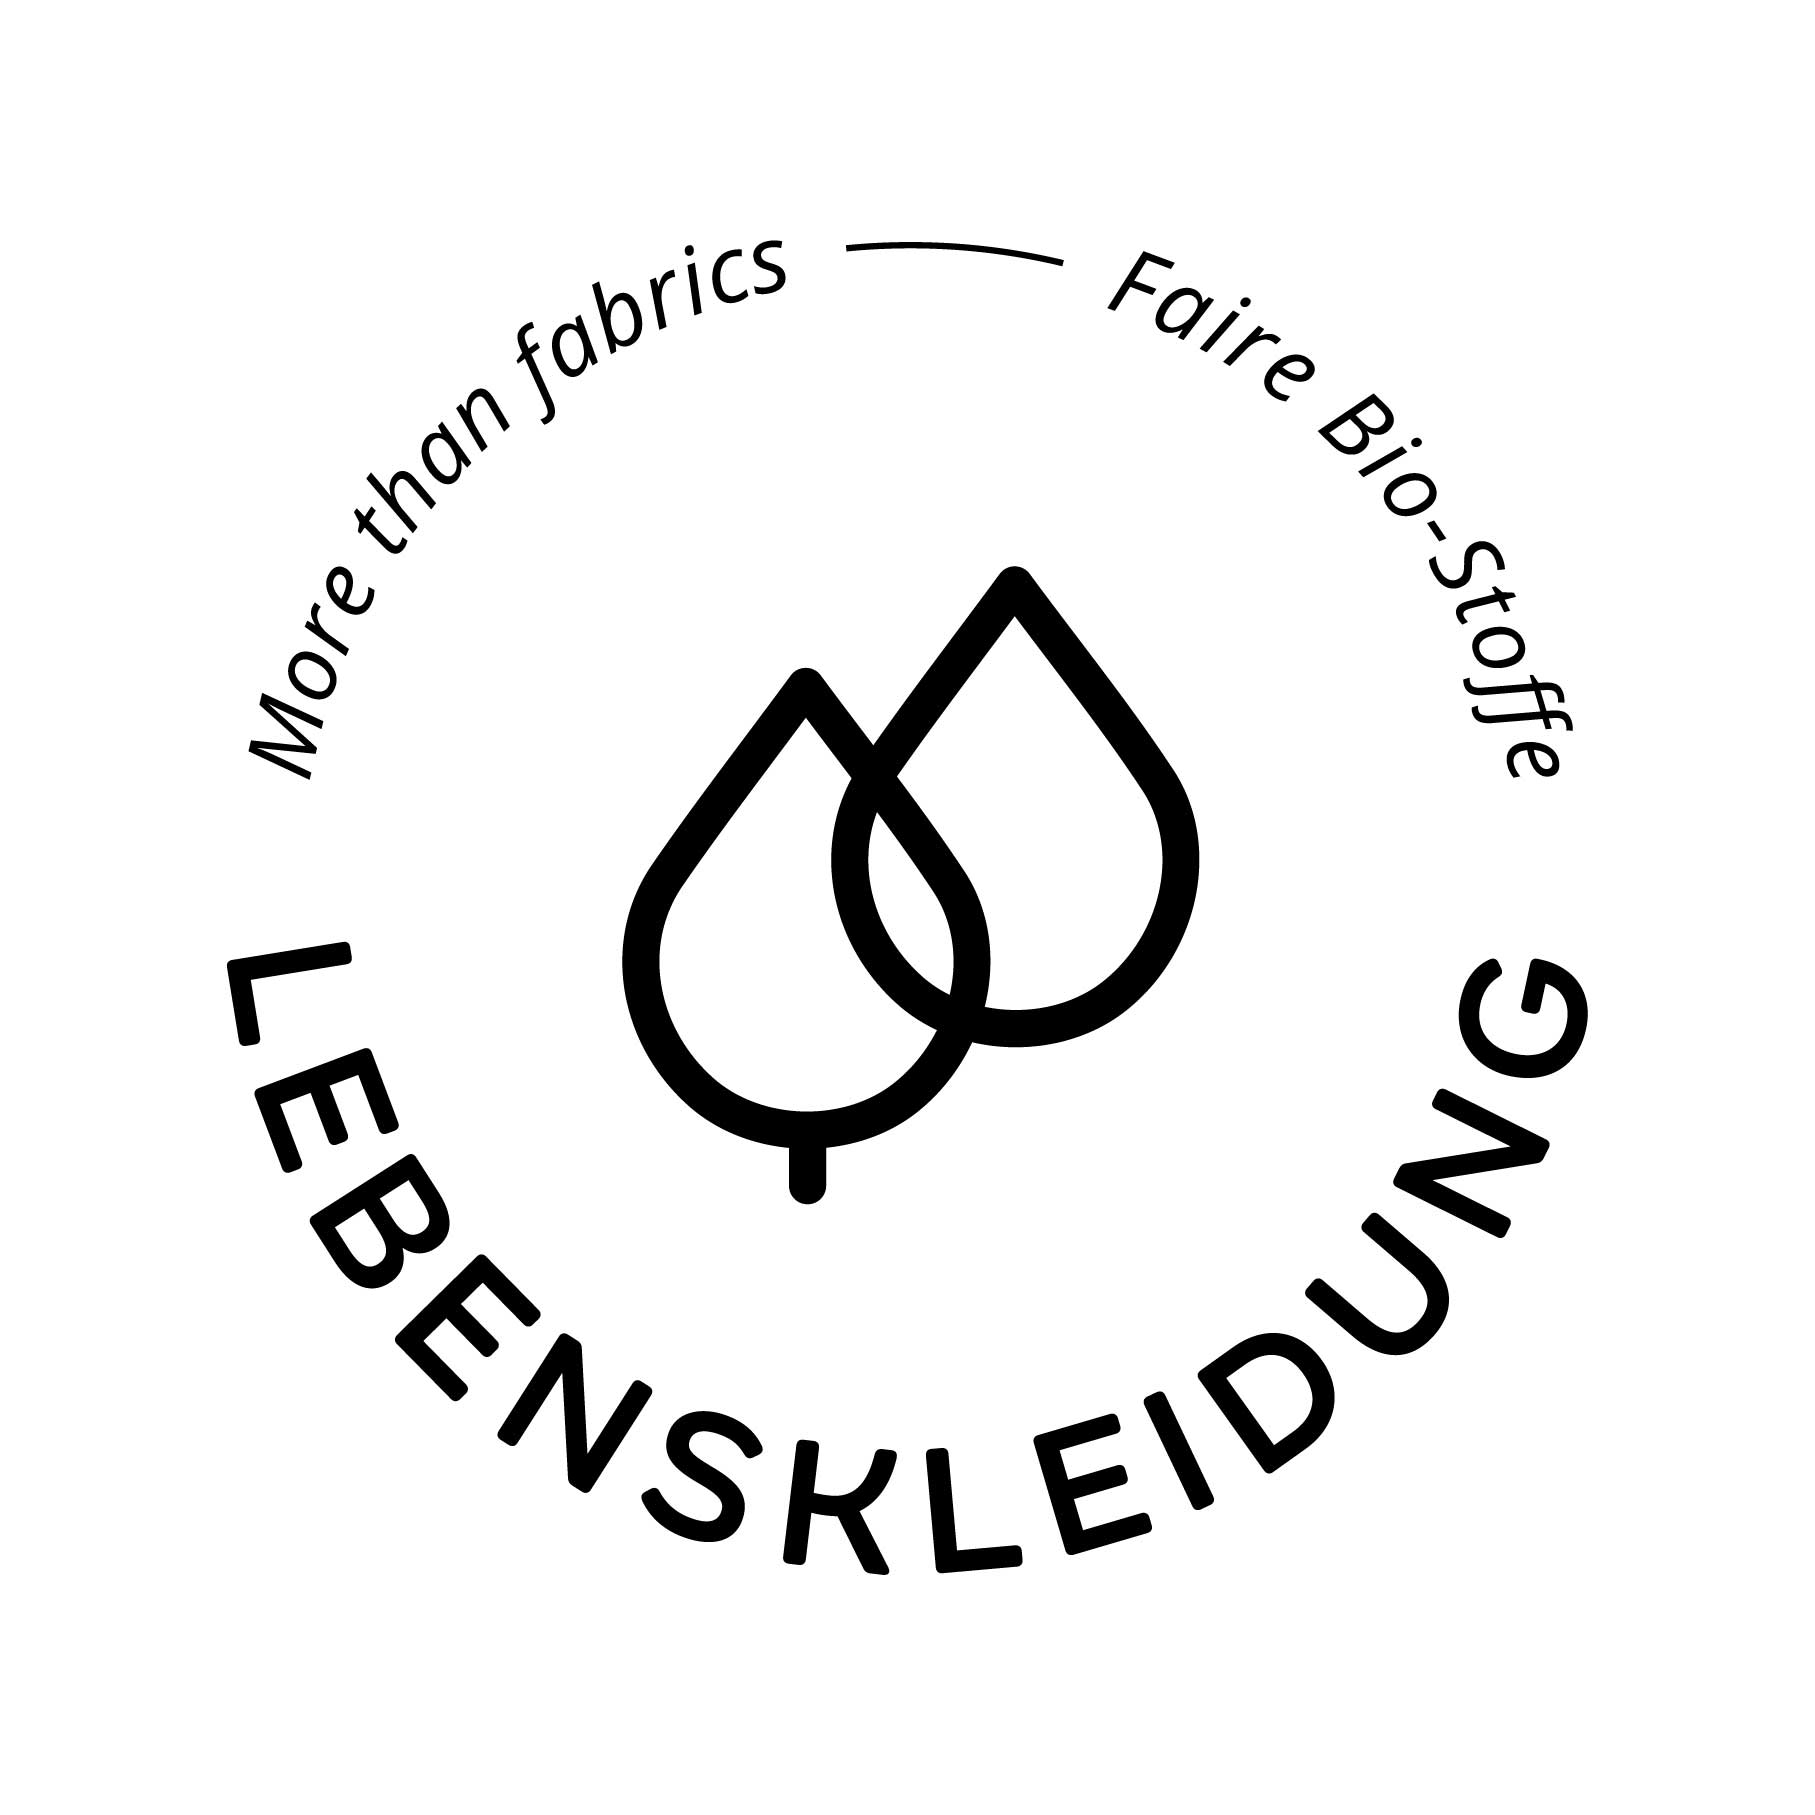 Organic RIB 2x1 (Cuff fabric) - Emerald